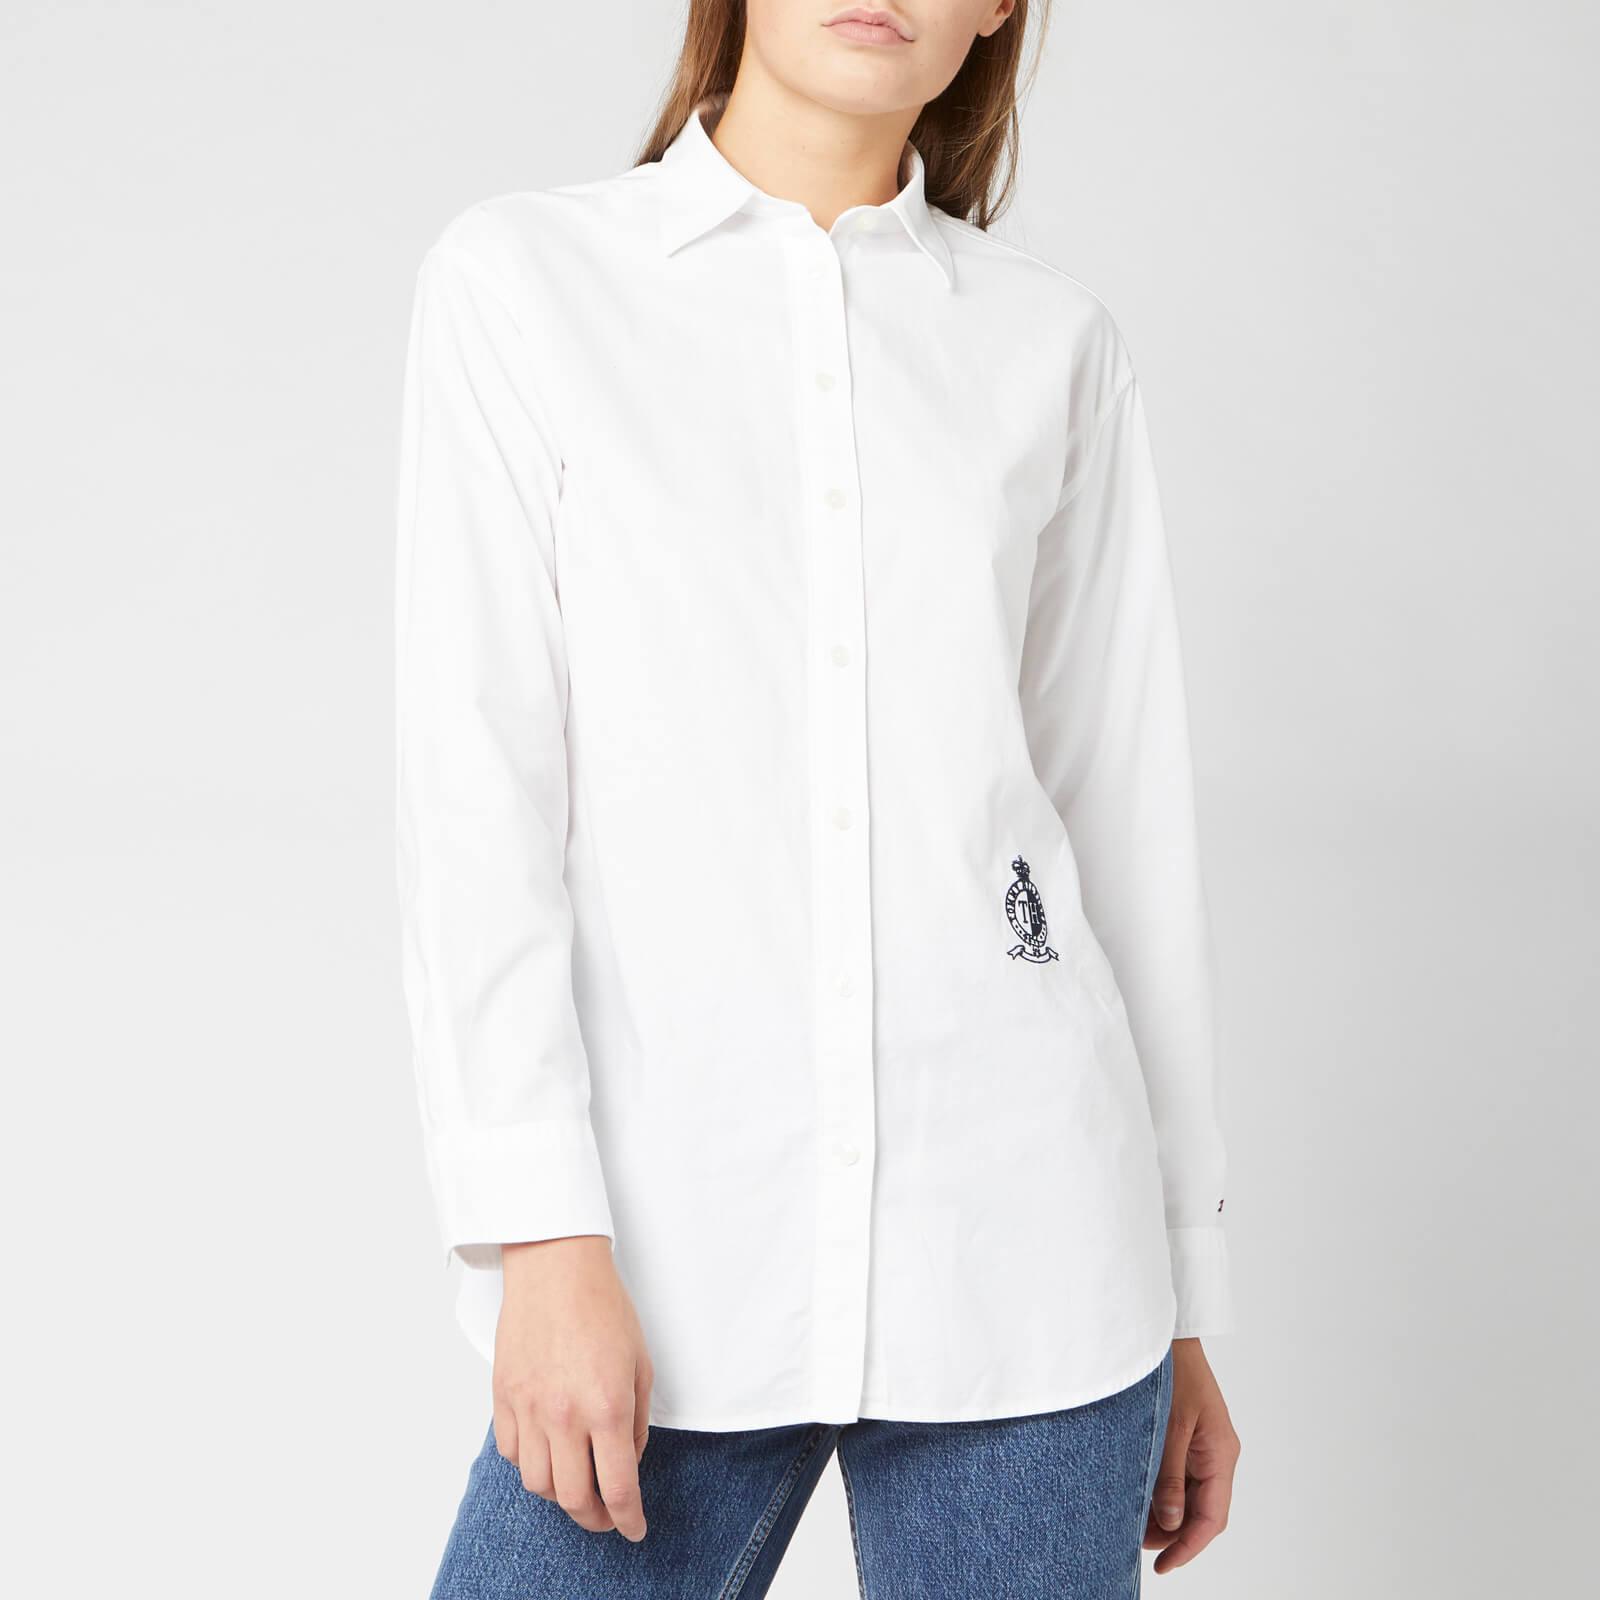 Tommy Hilfiger Women's Fawn Boyfriend Shirt - Classic White - US 6/UK 10 - White